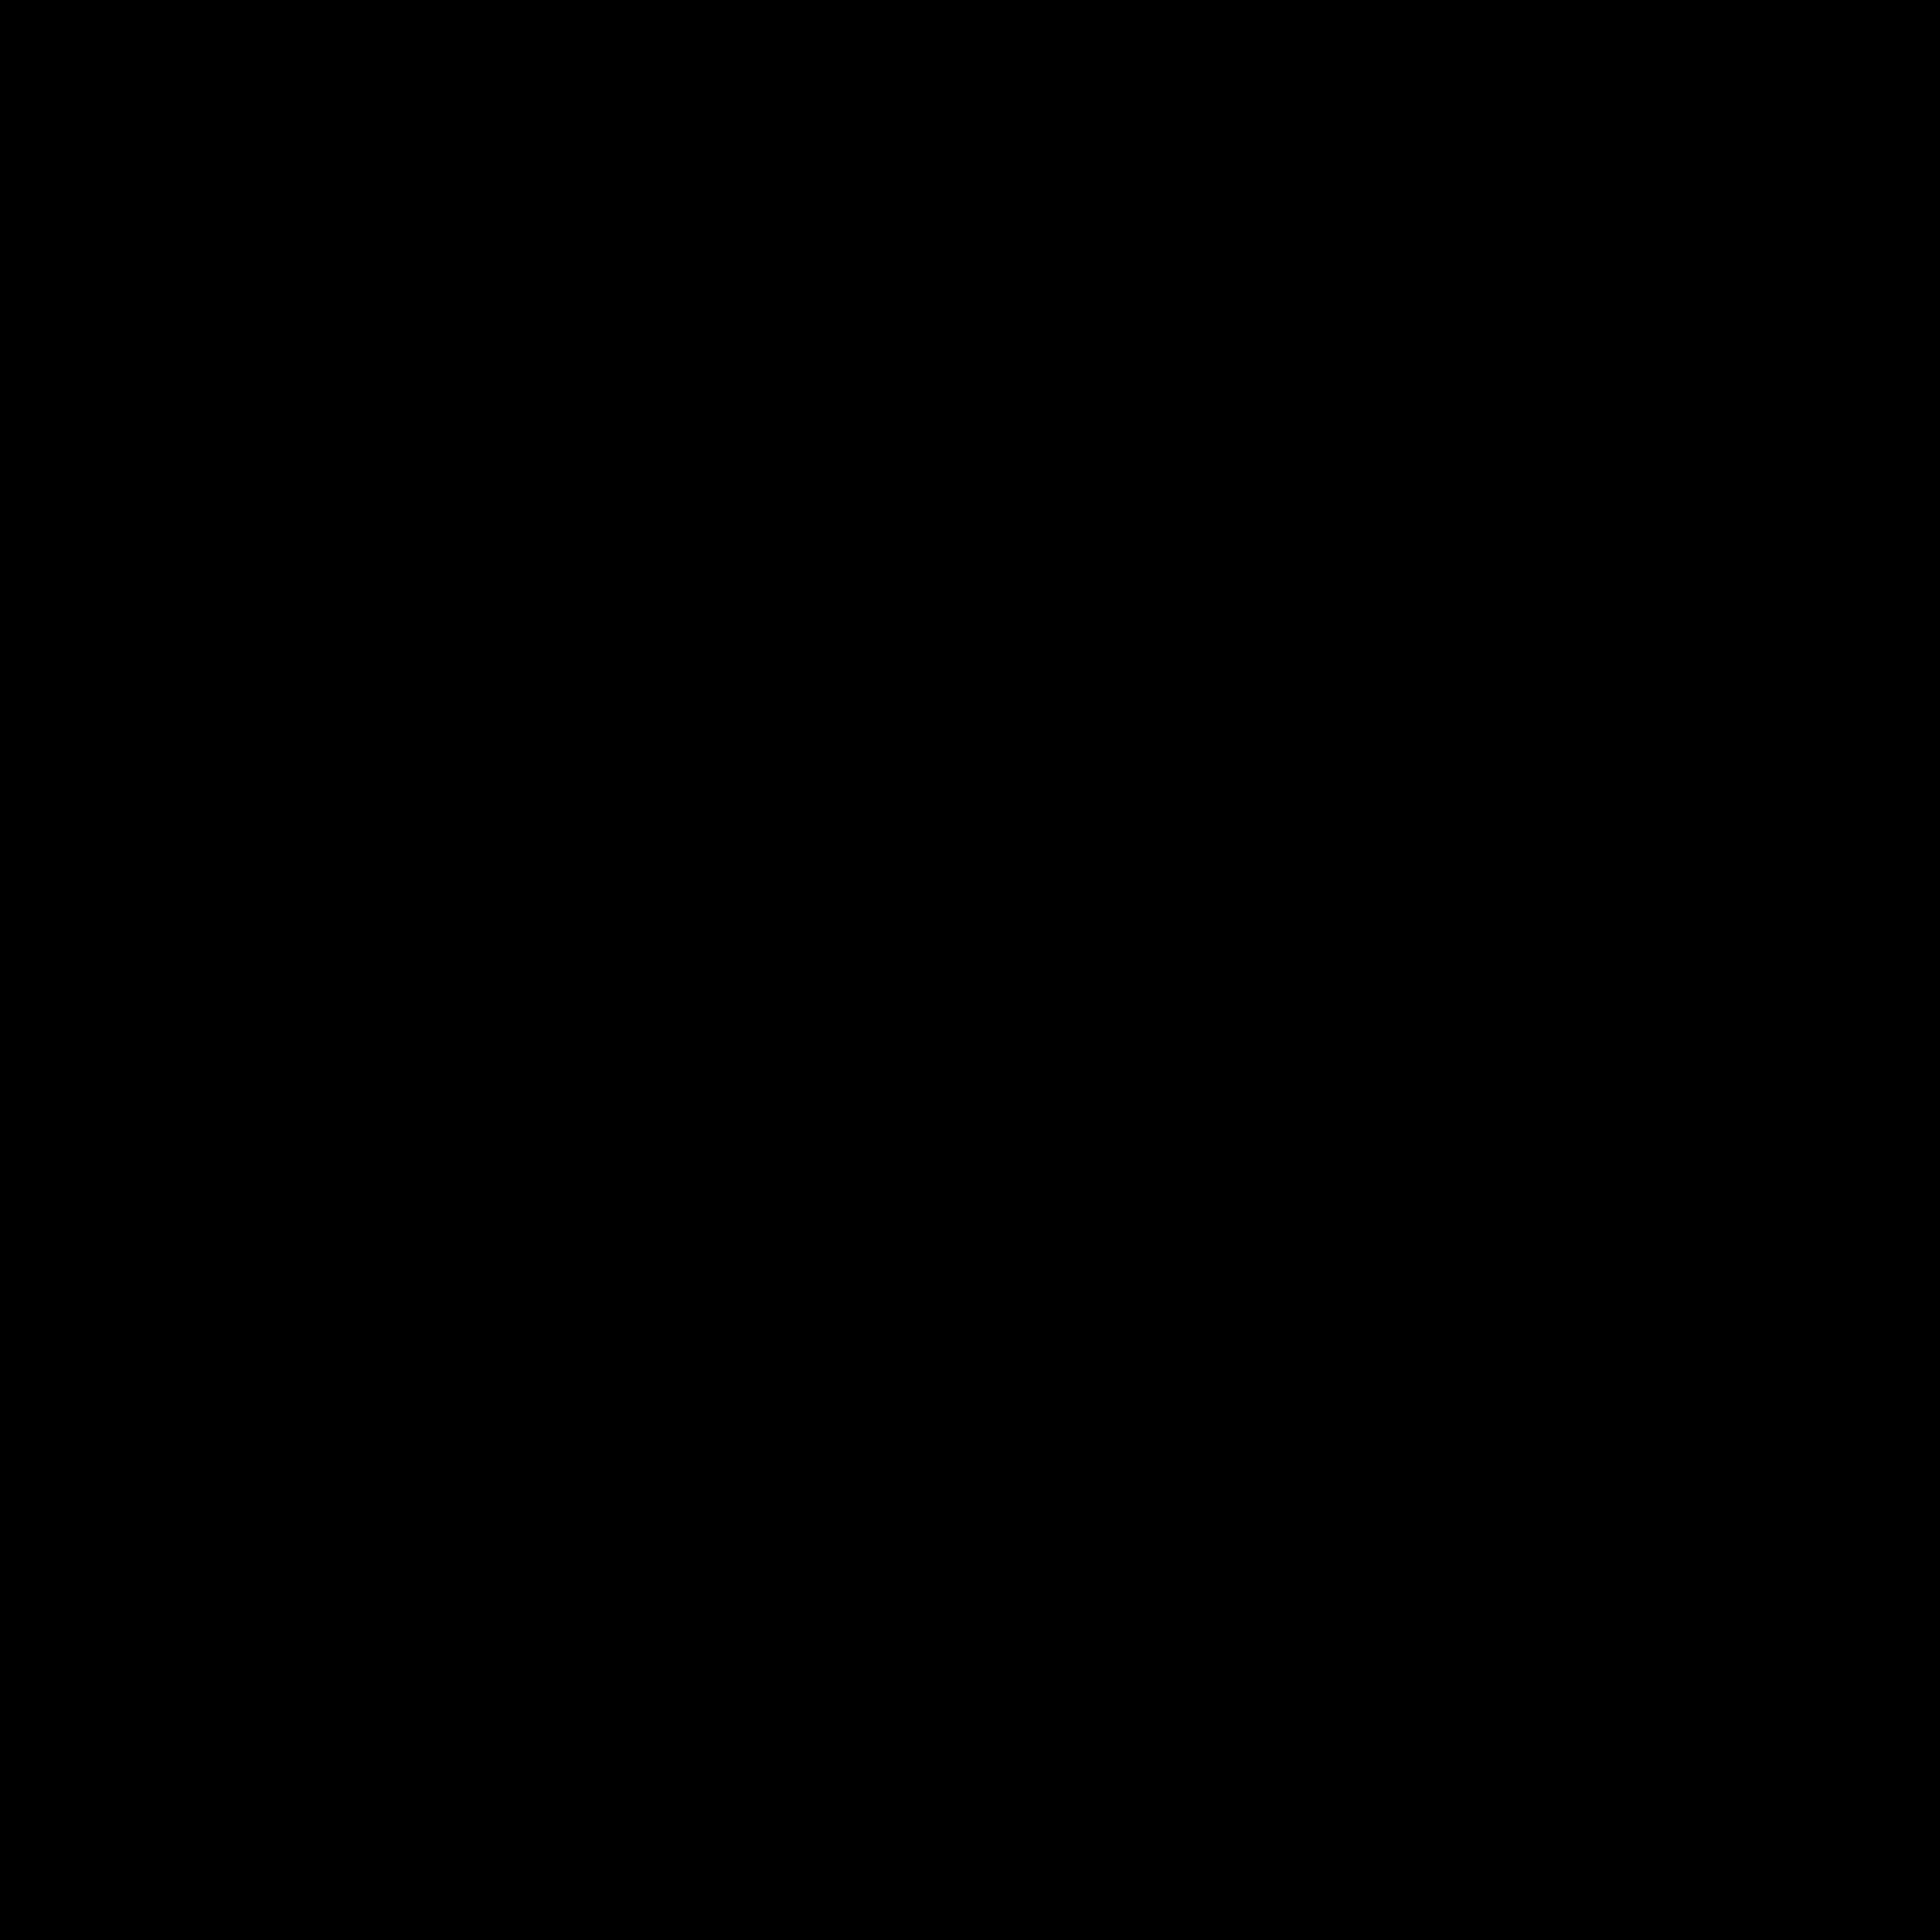 motorola-7-logo-png-transparent.png